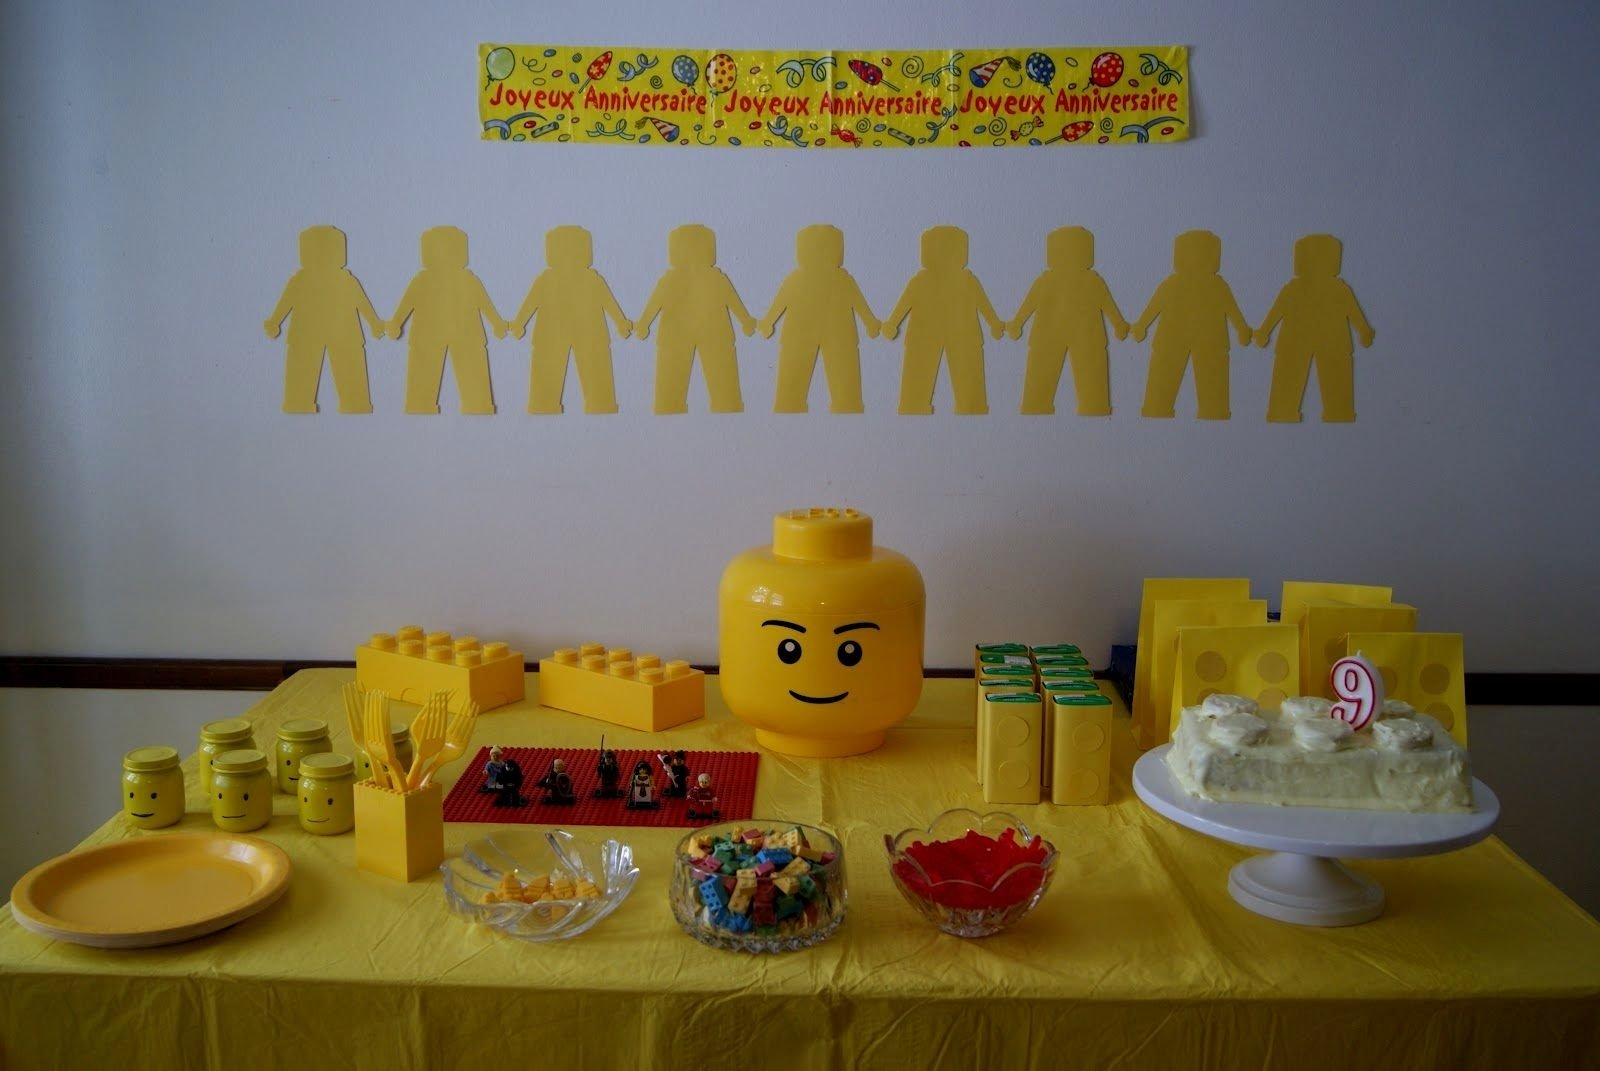 10 Fabulous Birthday Party Ideas For 8 Year Old Boy fresh 8 year old boy birthday party ideas photo birthday ideas 2021